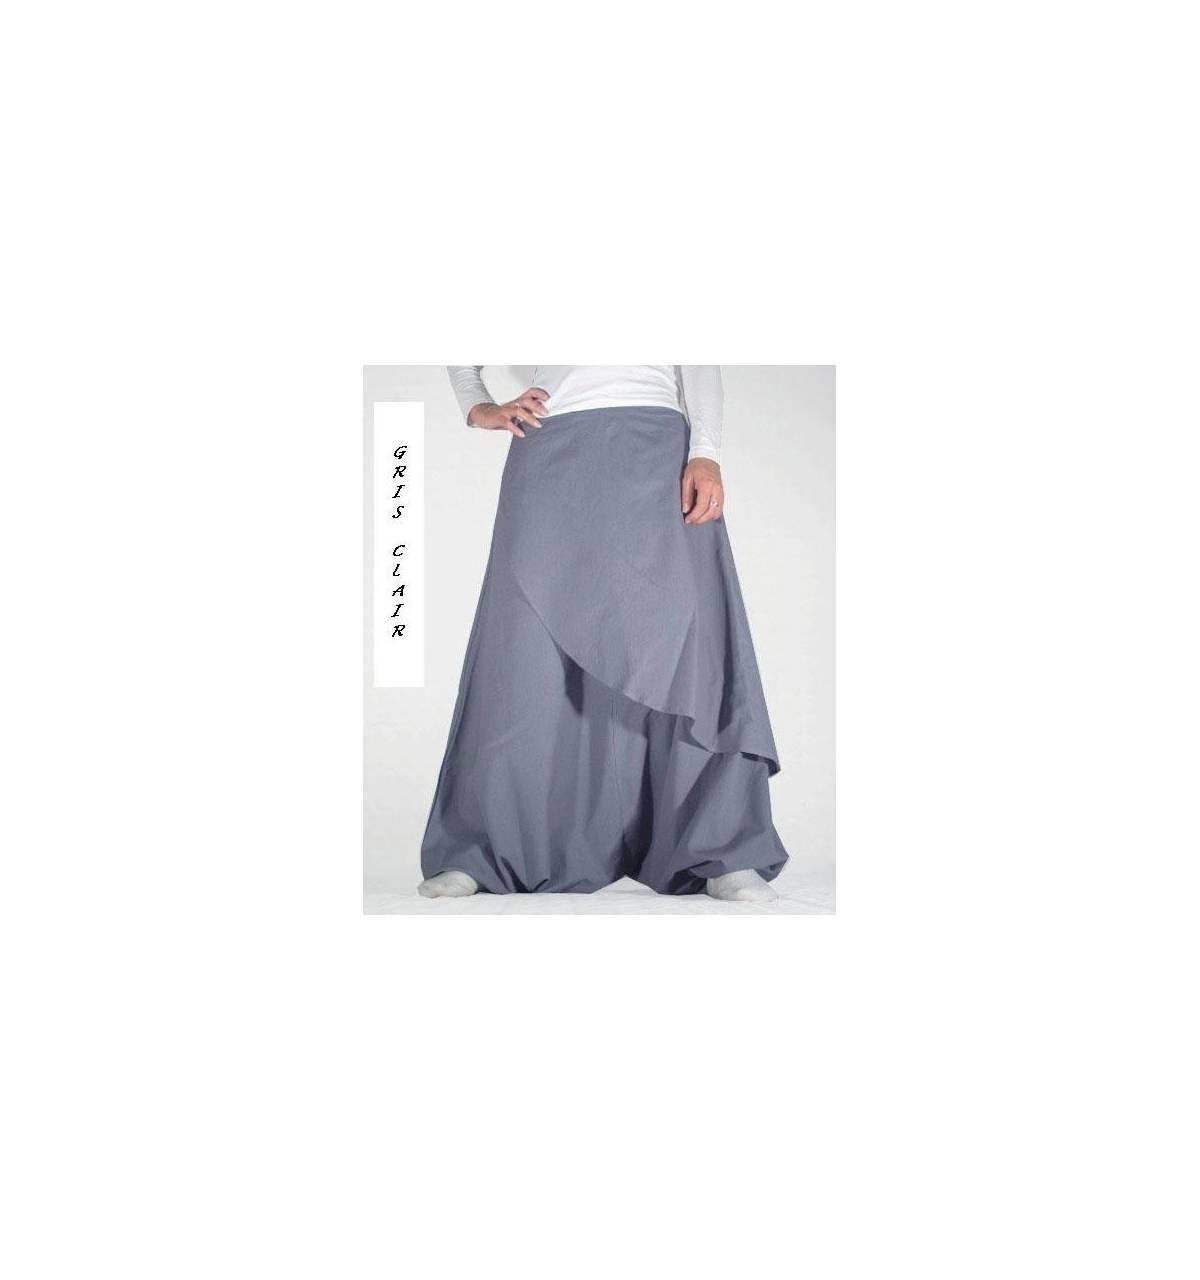 Sarouel ks10 toile de coton bismillah boutique - Toile de coton synonyme ...